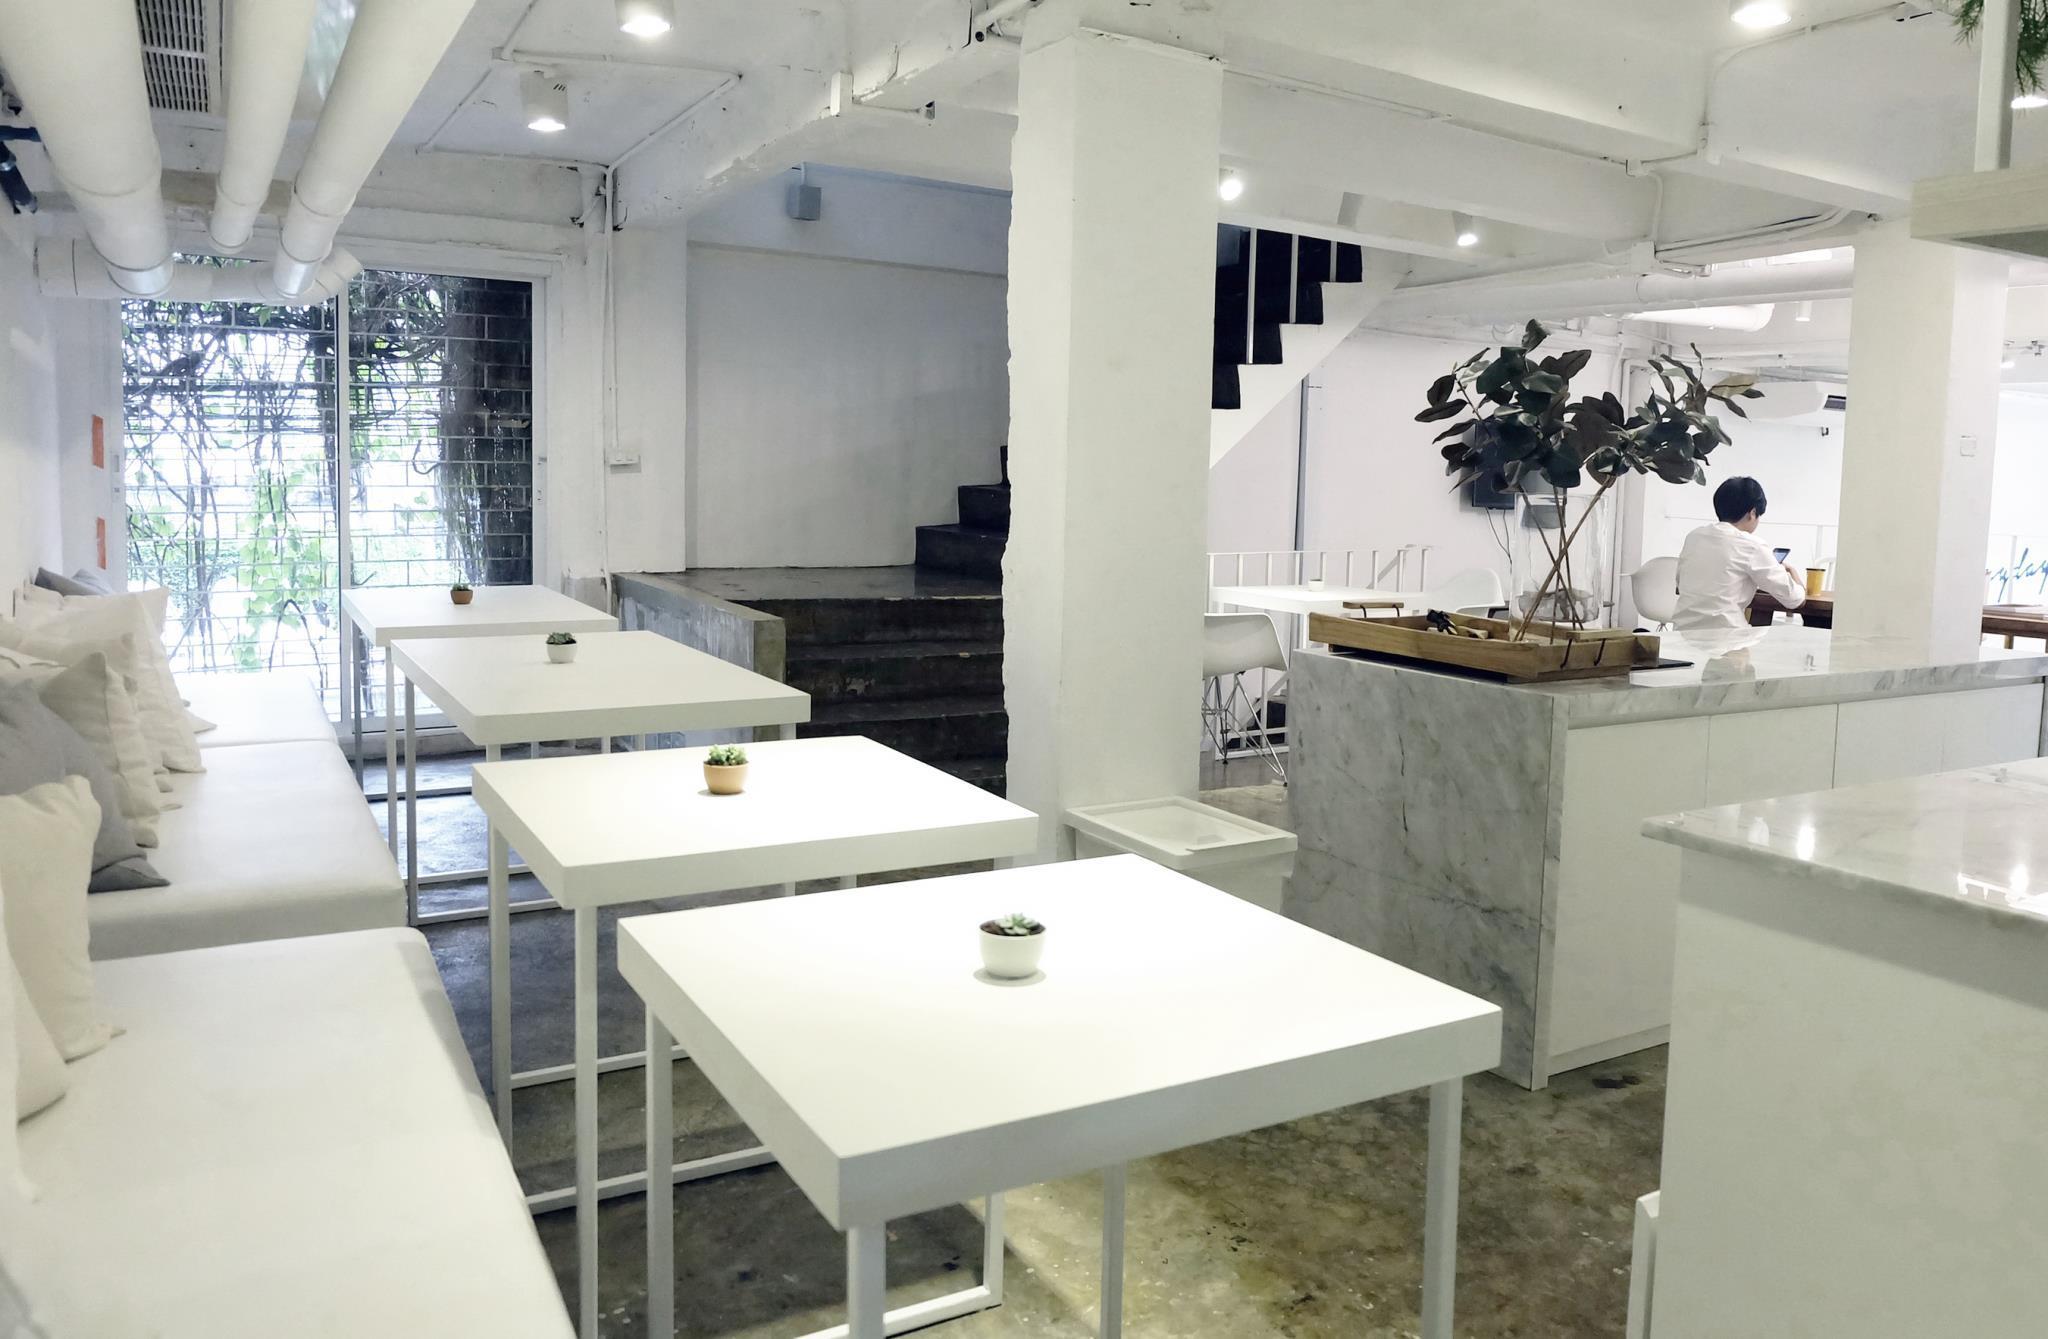 Everyday Sunday Social Hostel,เอฟเวอรี ซันเดย์ โซเชียล โฮสเทล